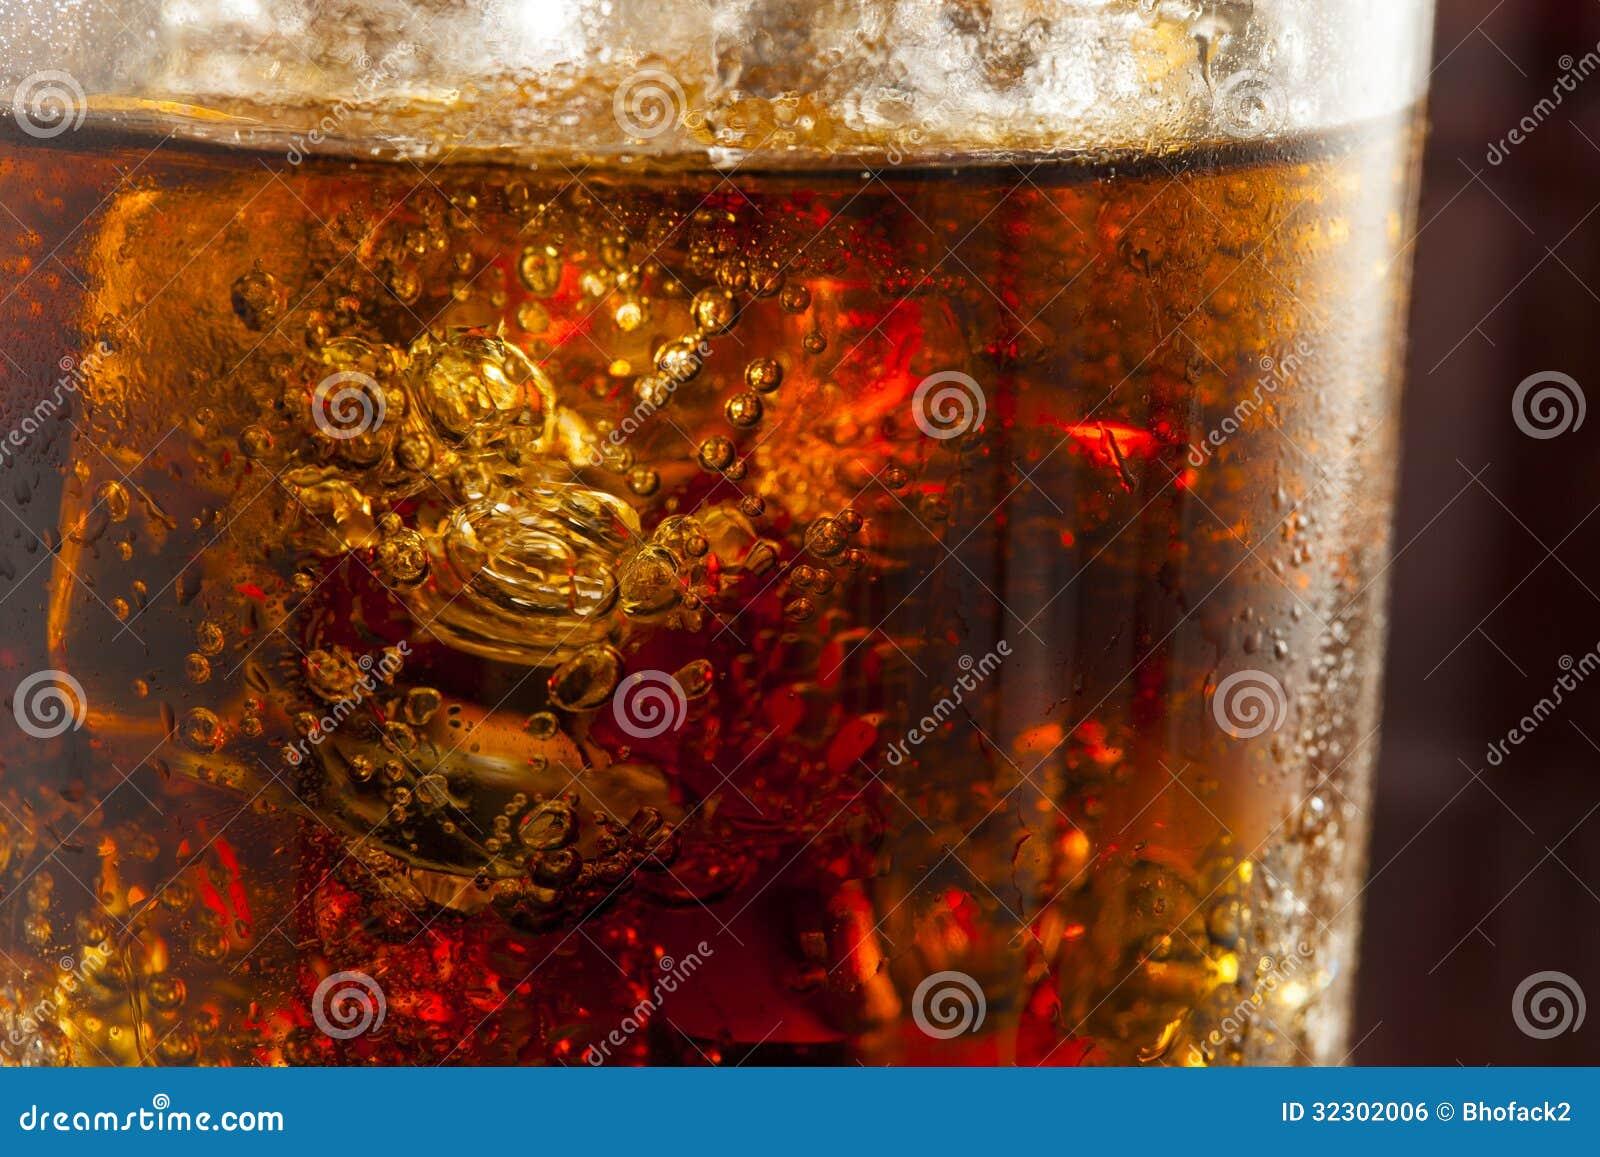 Soda glacé régénérateur